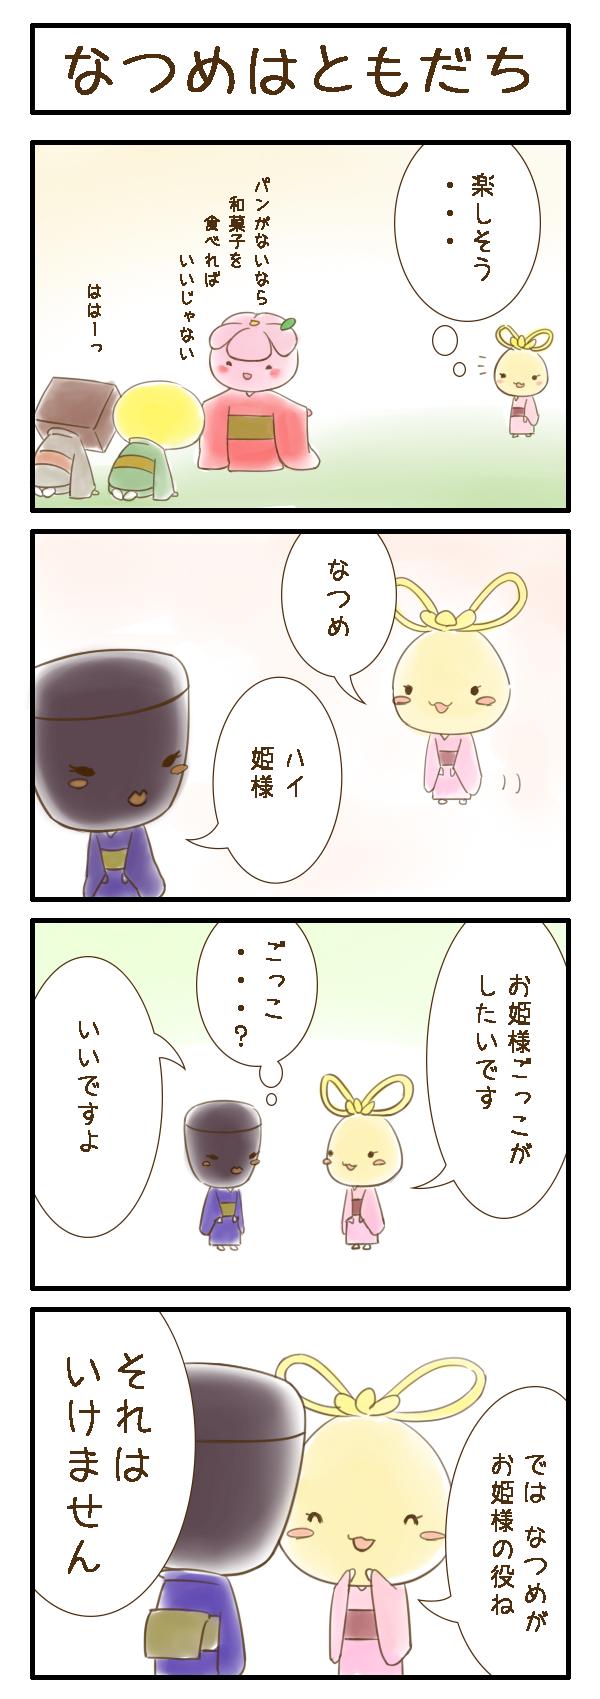 tomodachi01